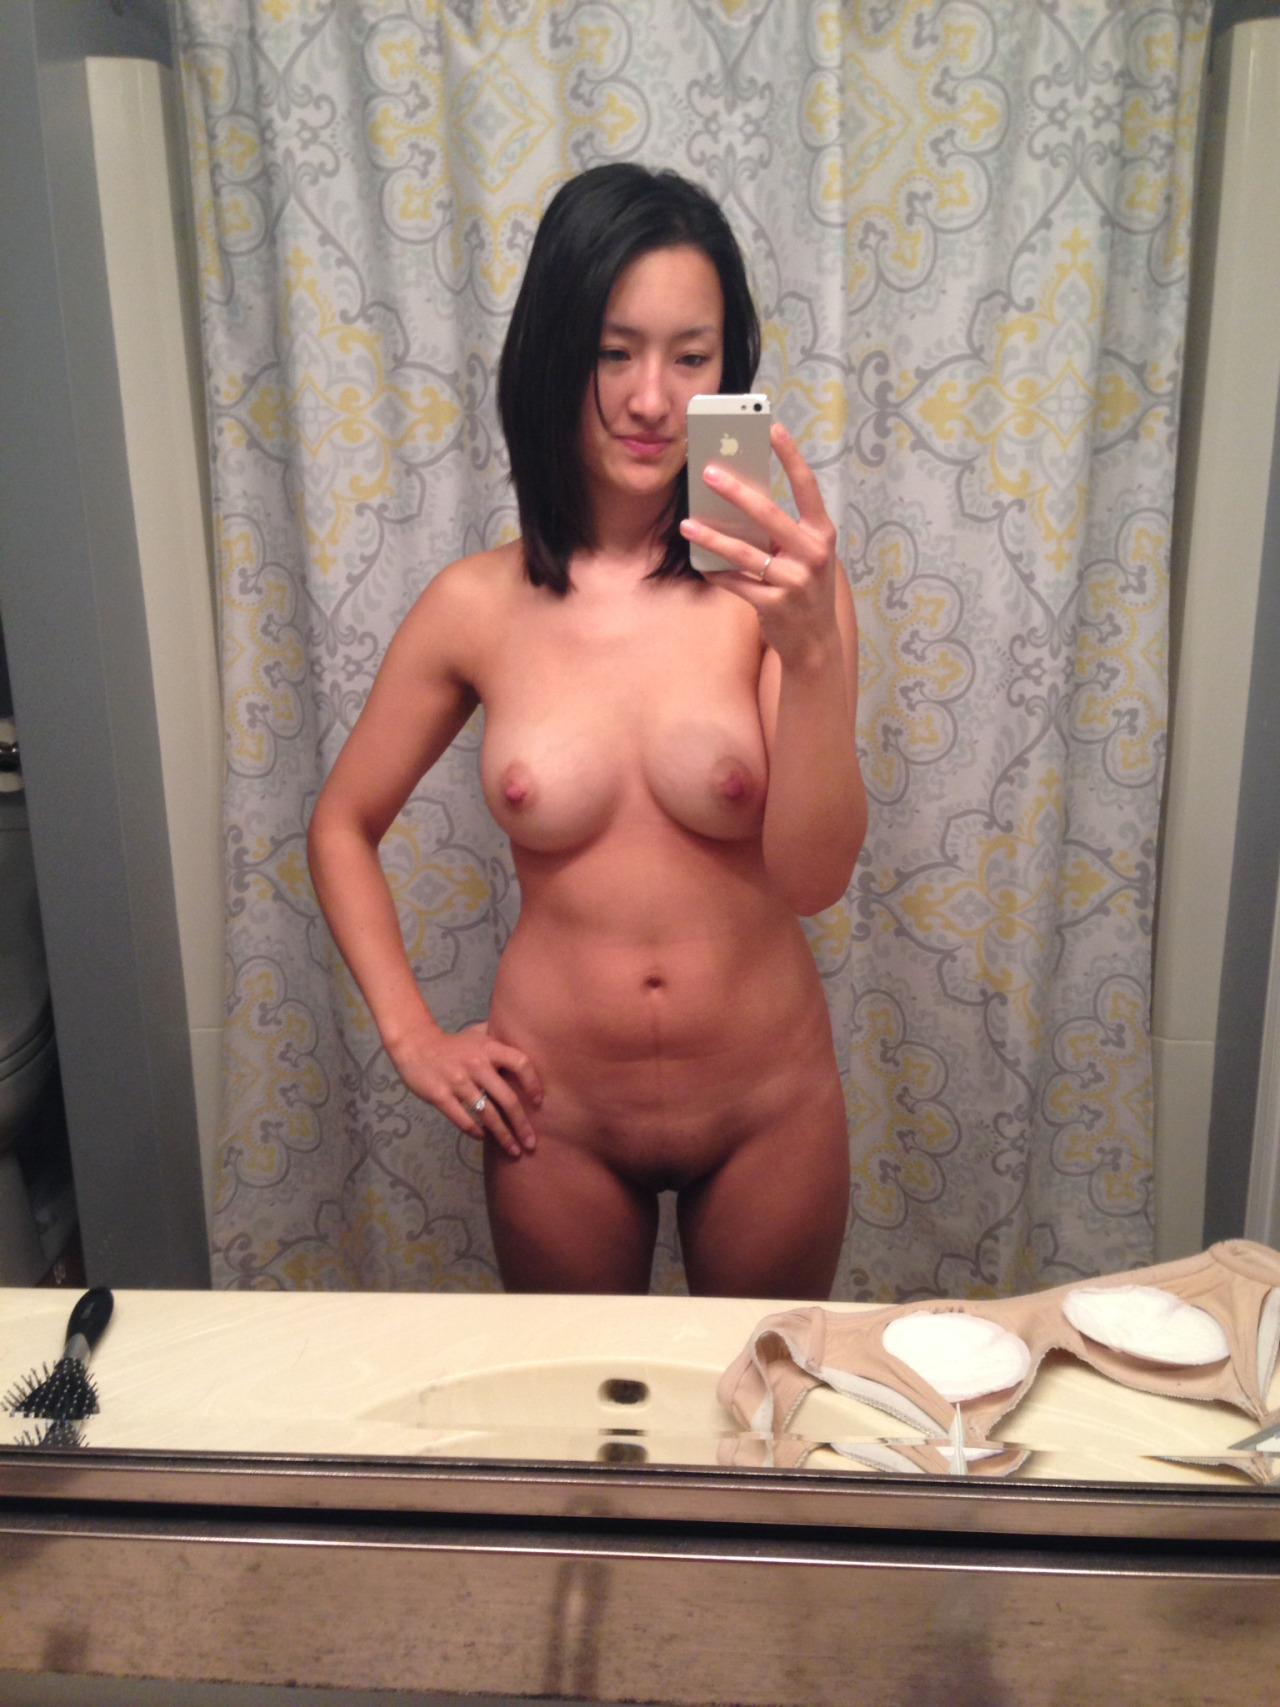 Adult videos Bizarre sexy nude video